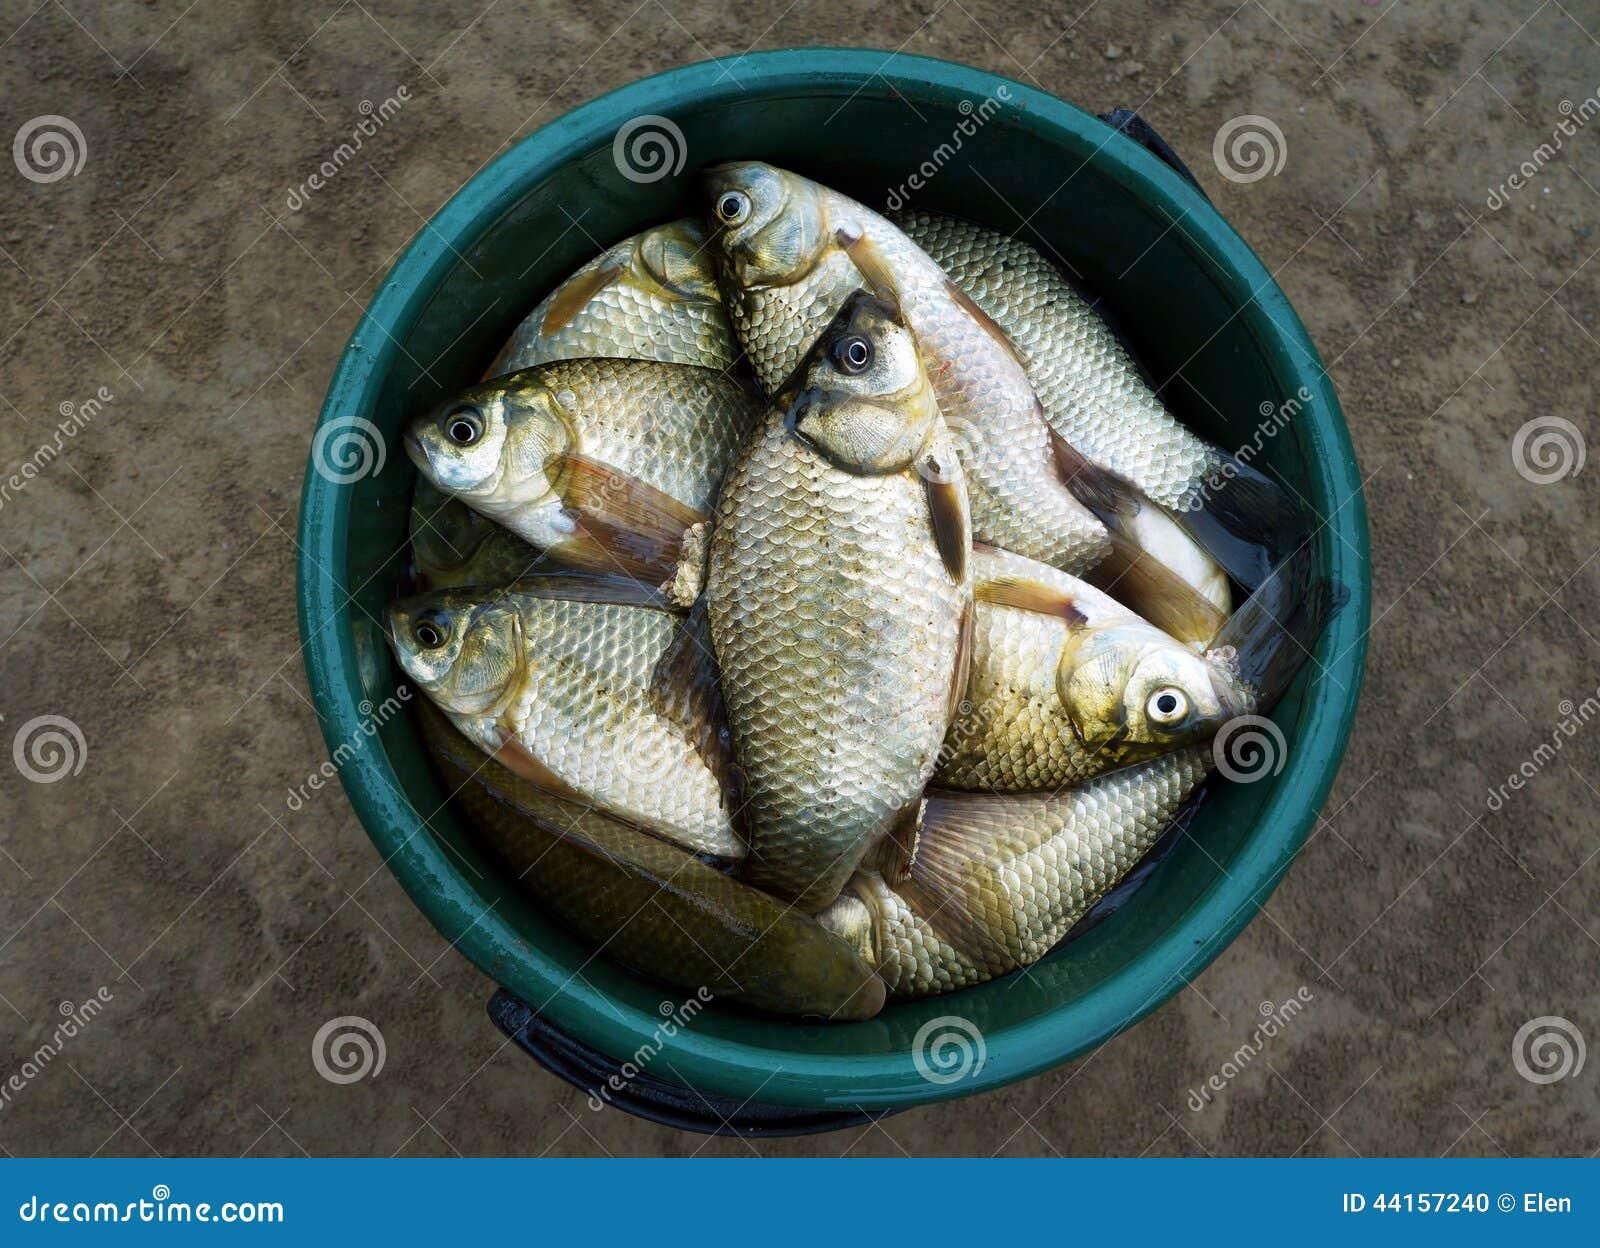 Fish crucian river carp stock photo image 44157240 for Bucket of fish